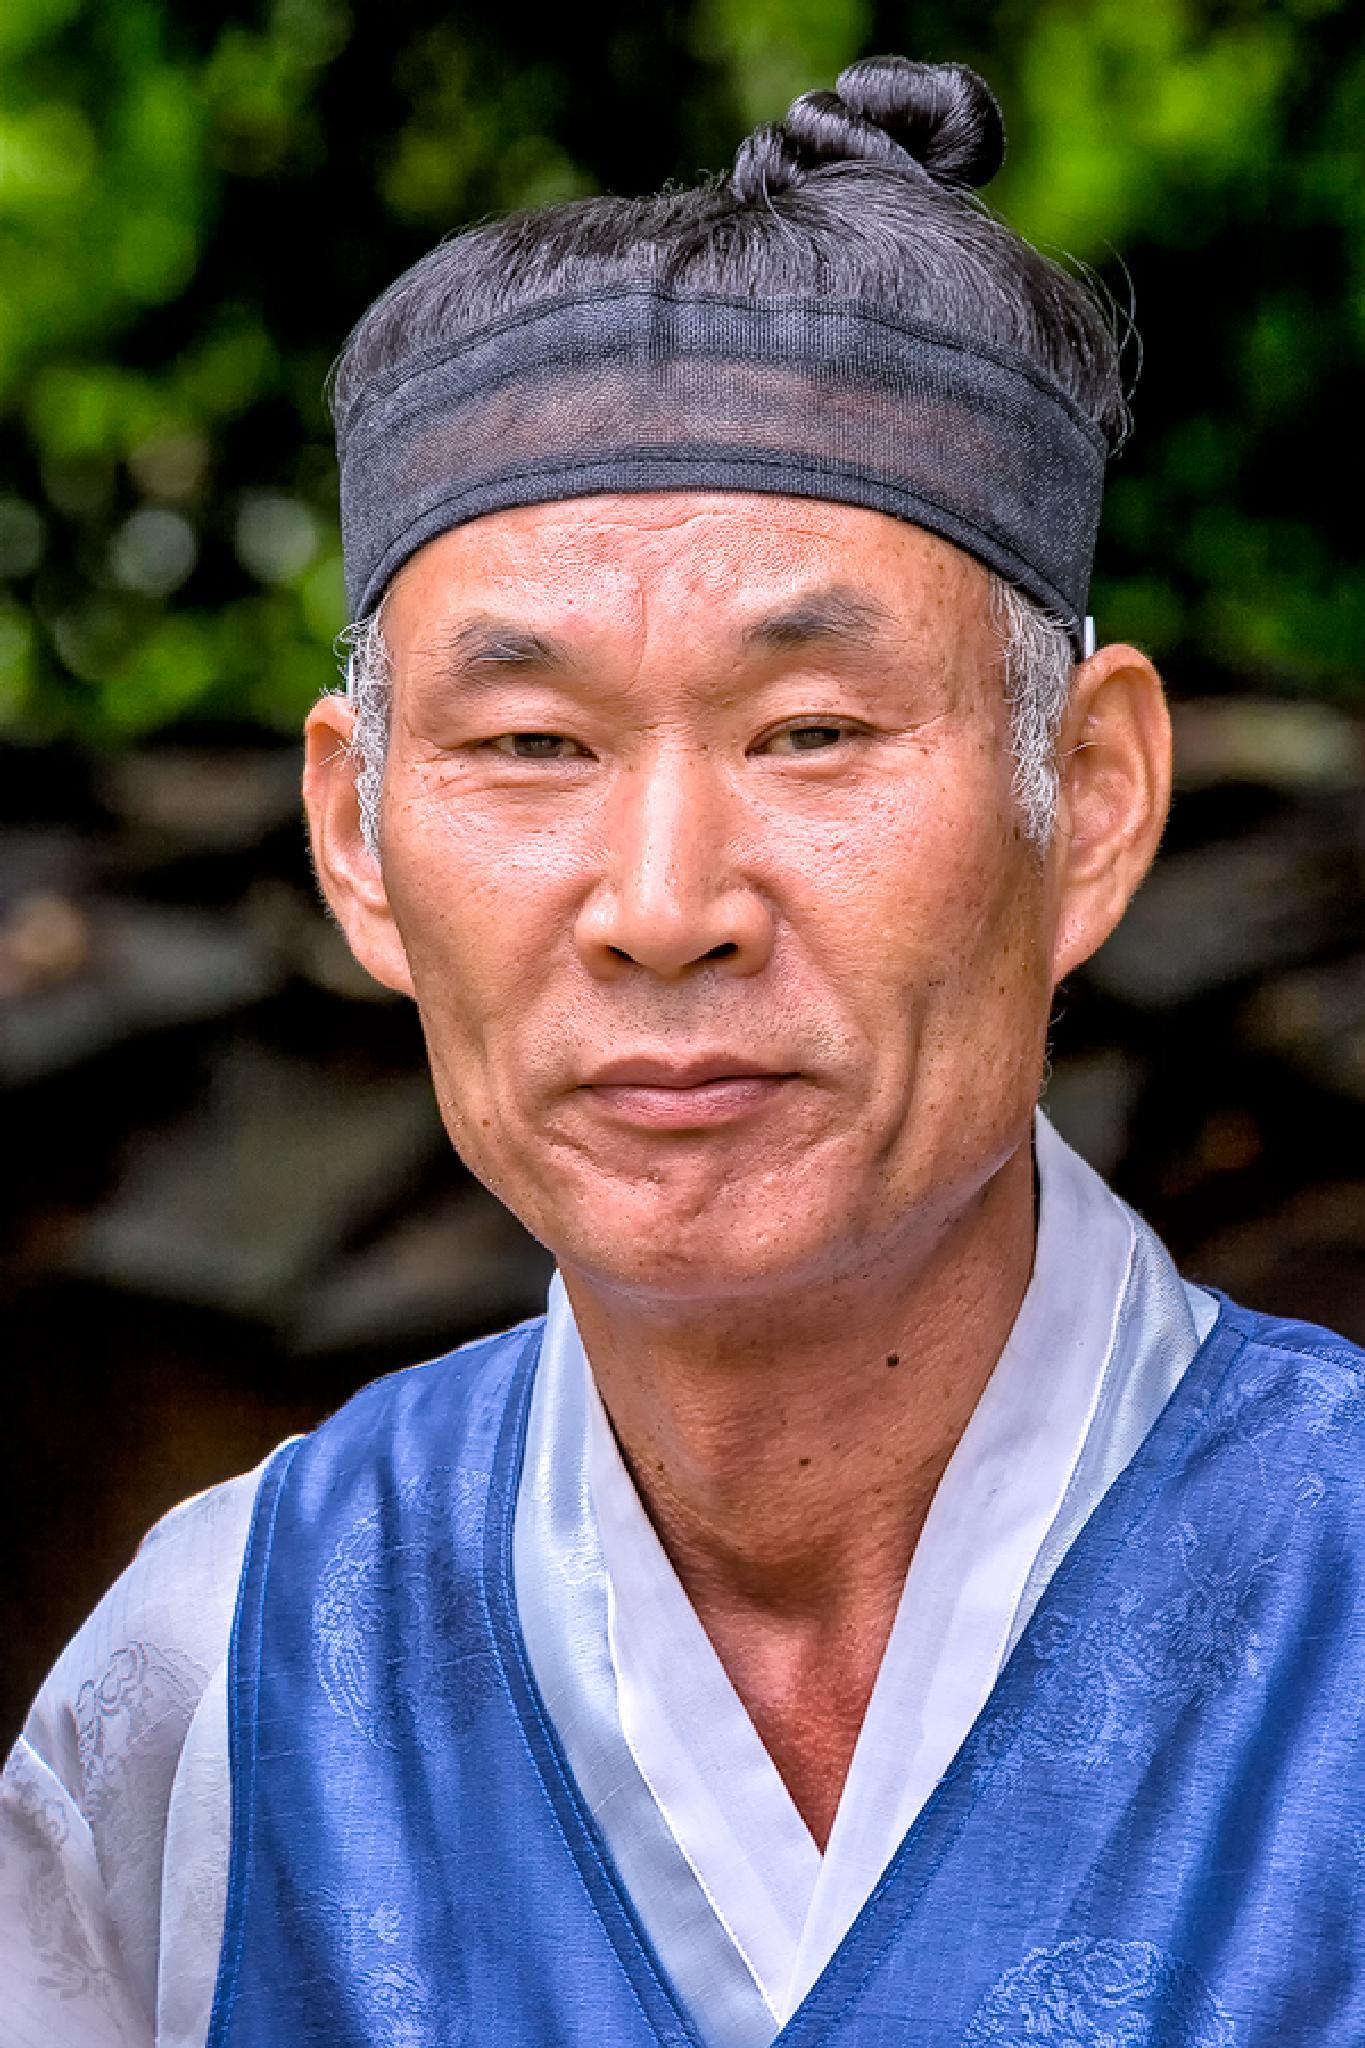 Old Style Korean Guy by dinajona